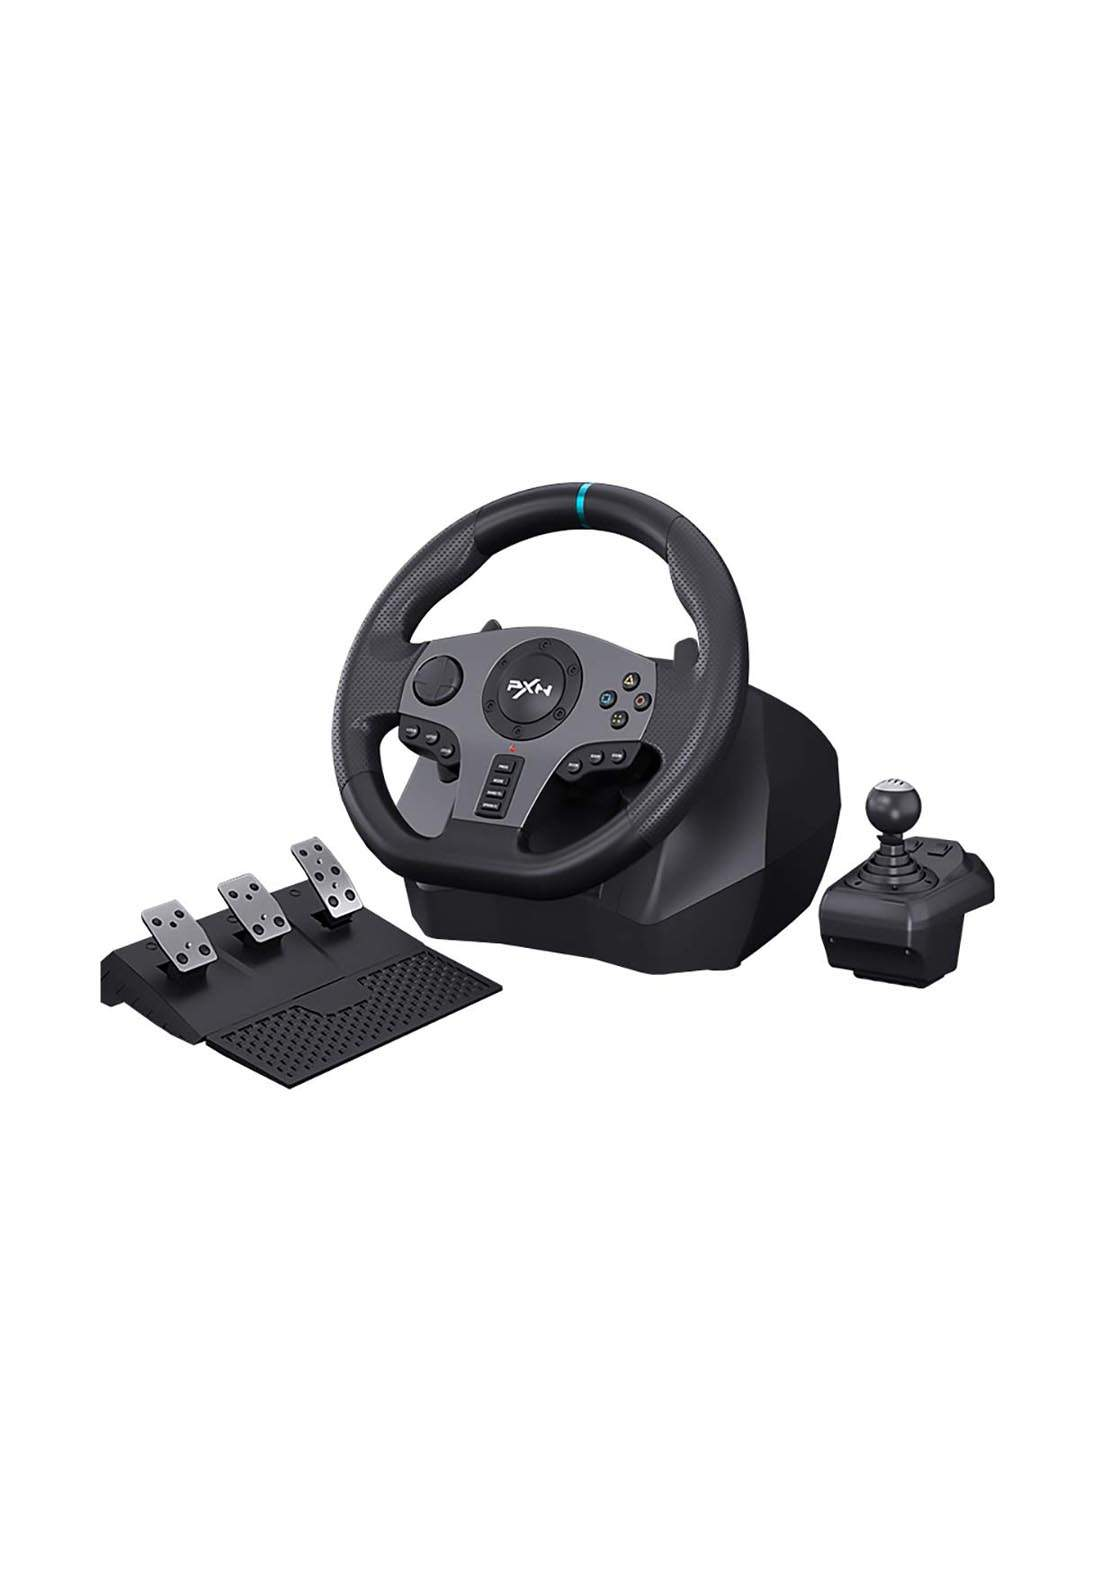 PXN V9   Racing Steering Wheel Set with Clutch and Shifter - Black عجلة قيادة ودواسة وناقل حركة للالعاب